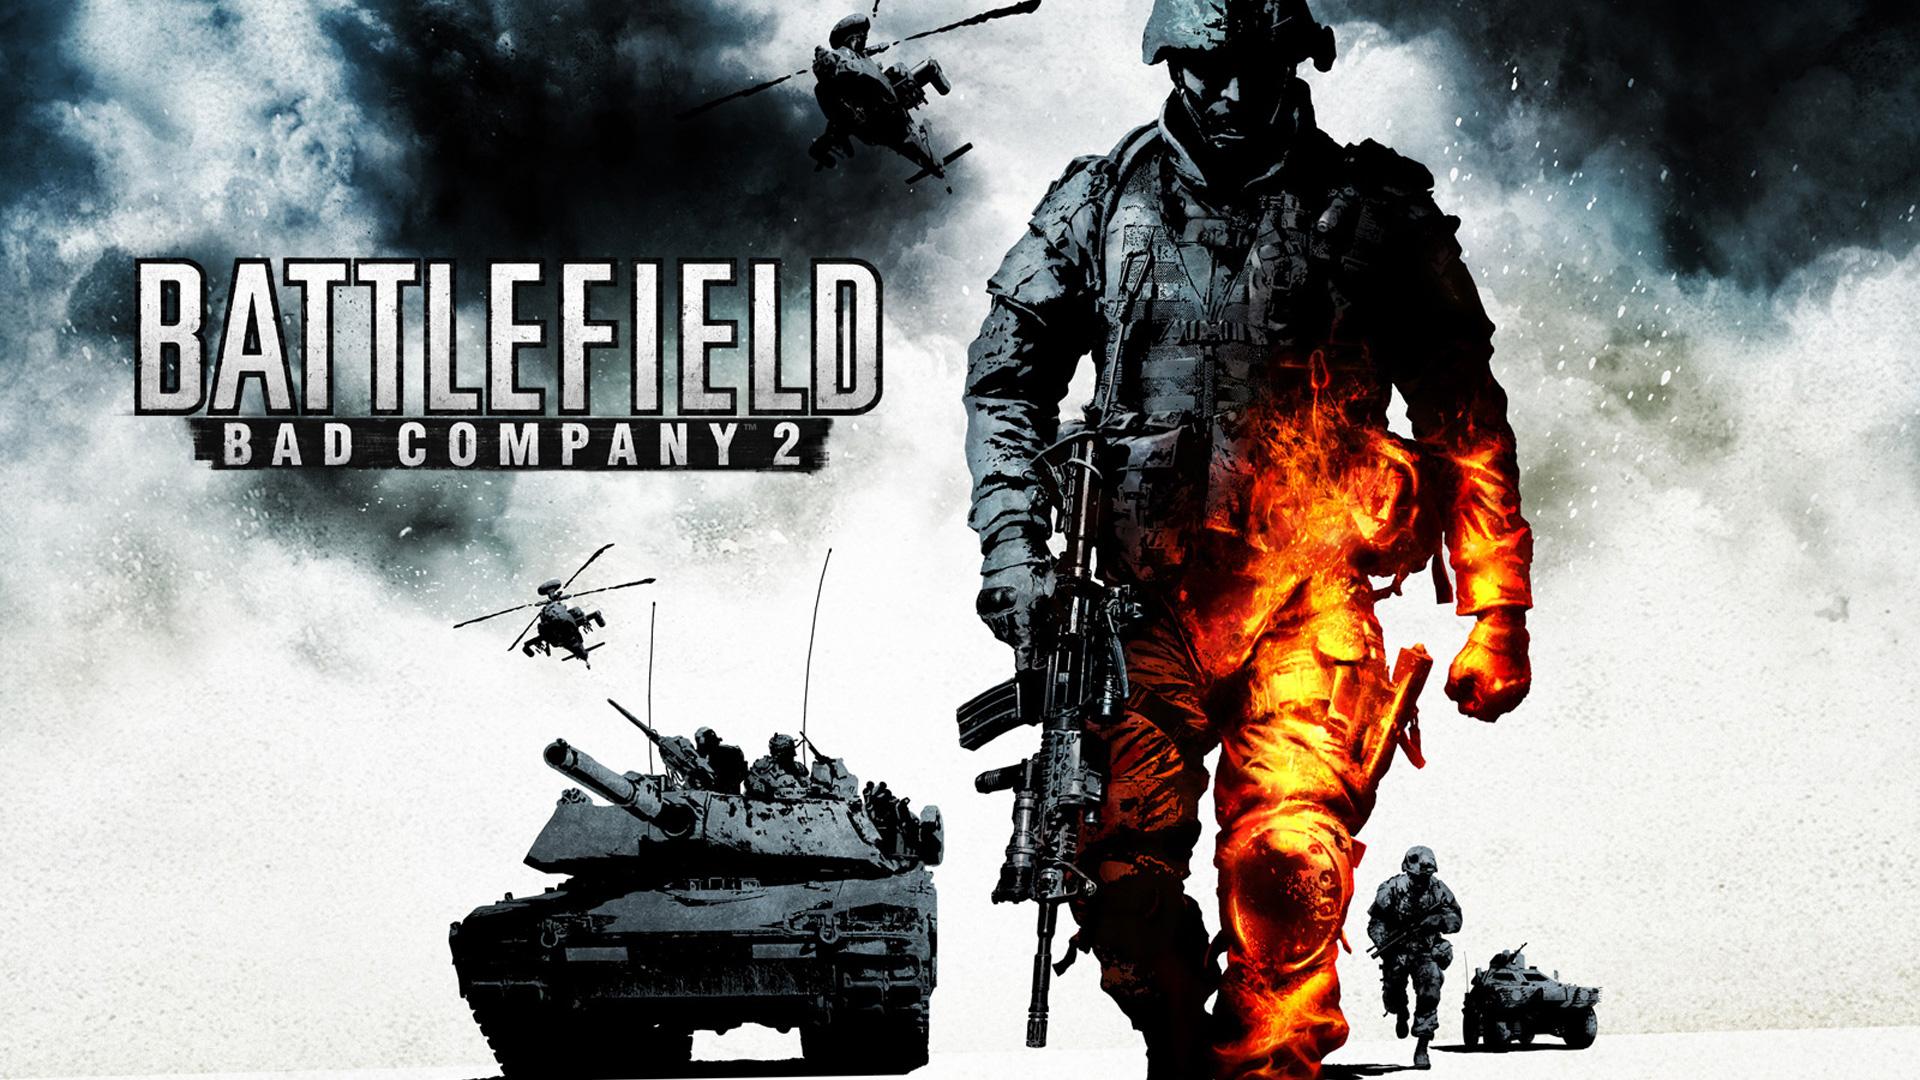 Battlefield Bad Company 2 wallpaper 2